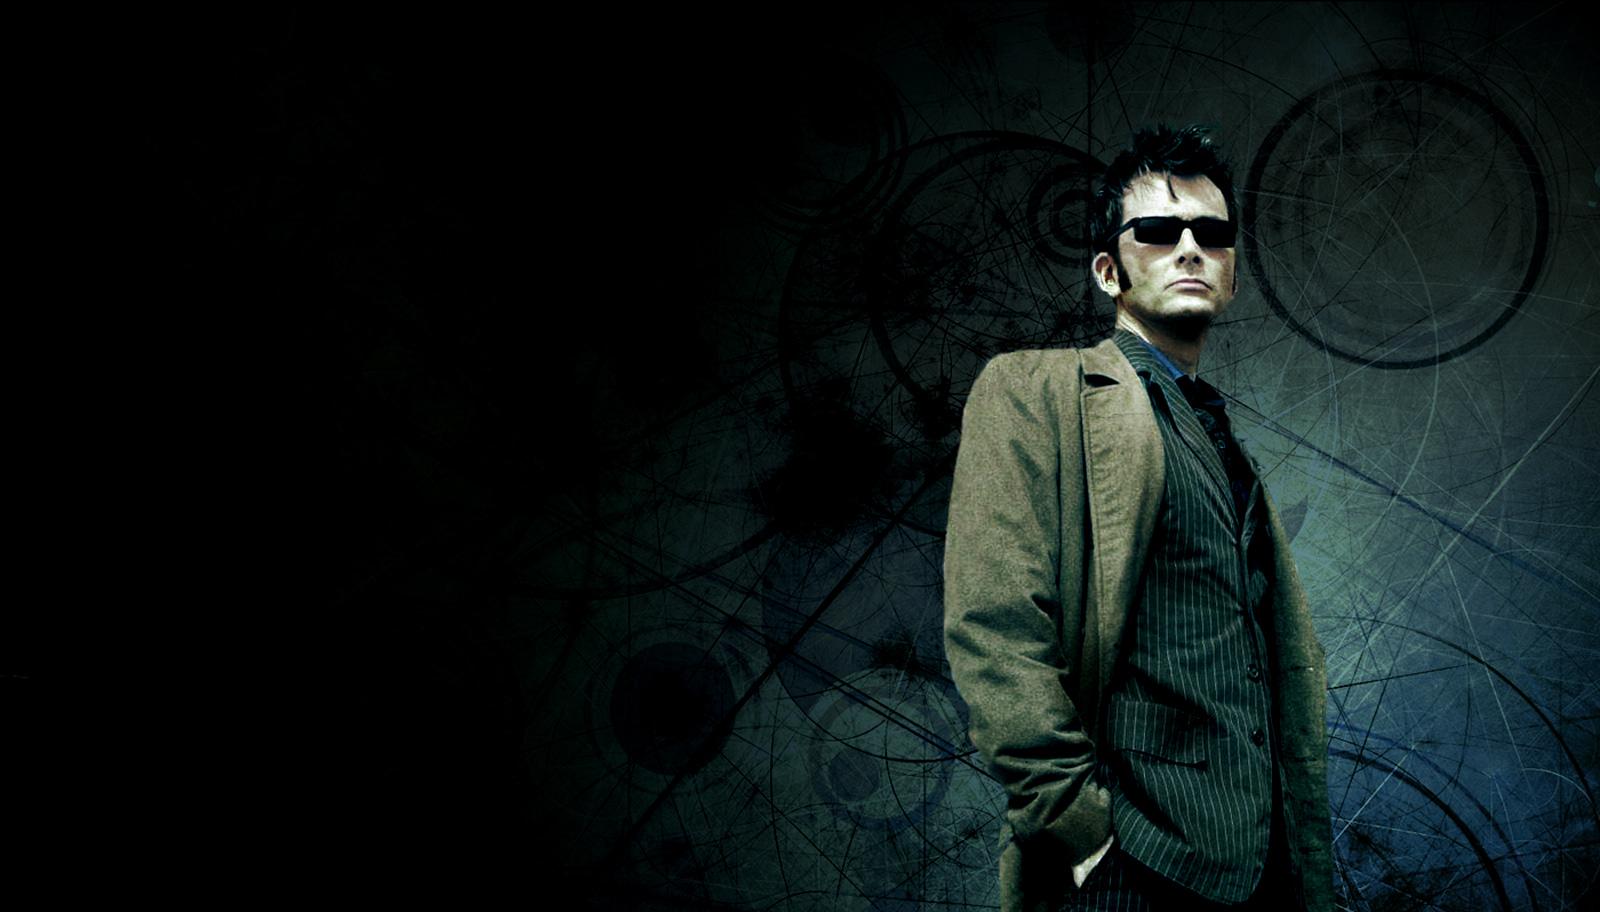 David Tennant Doctor Who HD Photo Wallpapers Desktop Wallpapers 1600x912